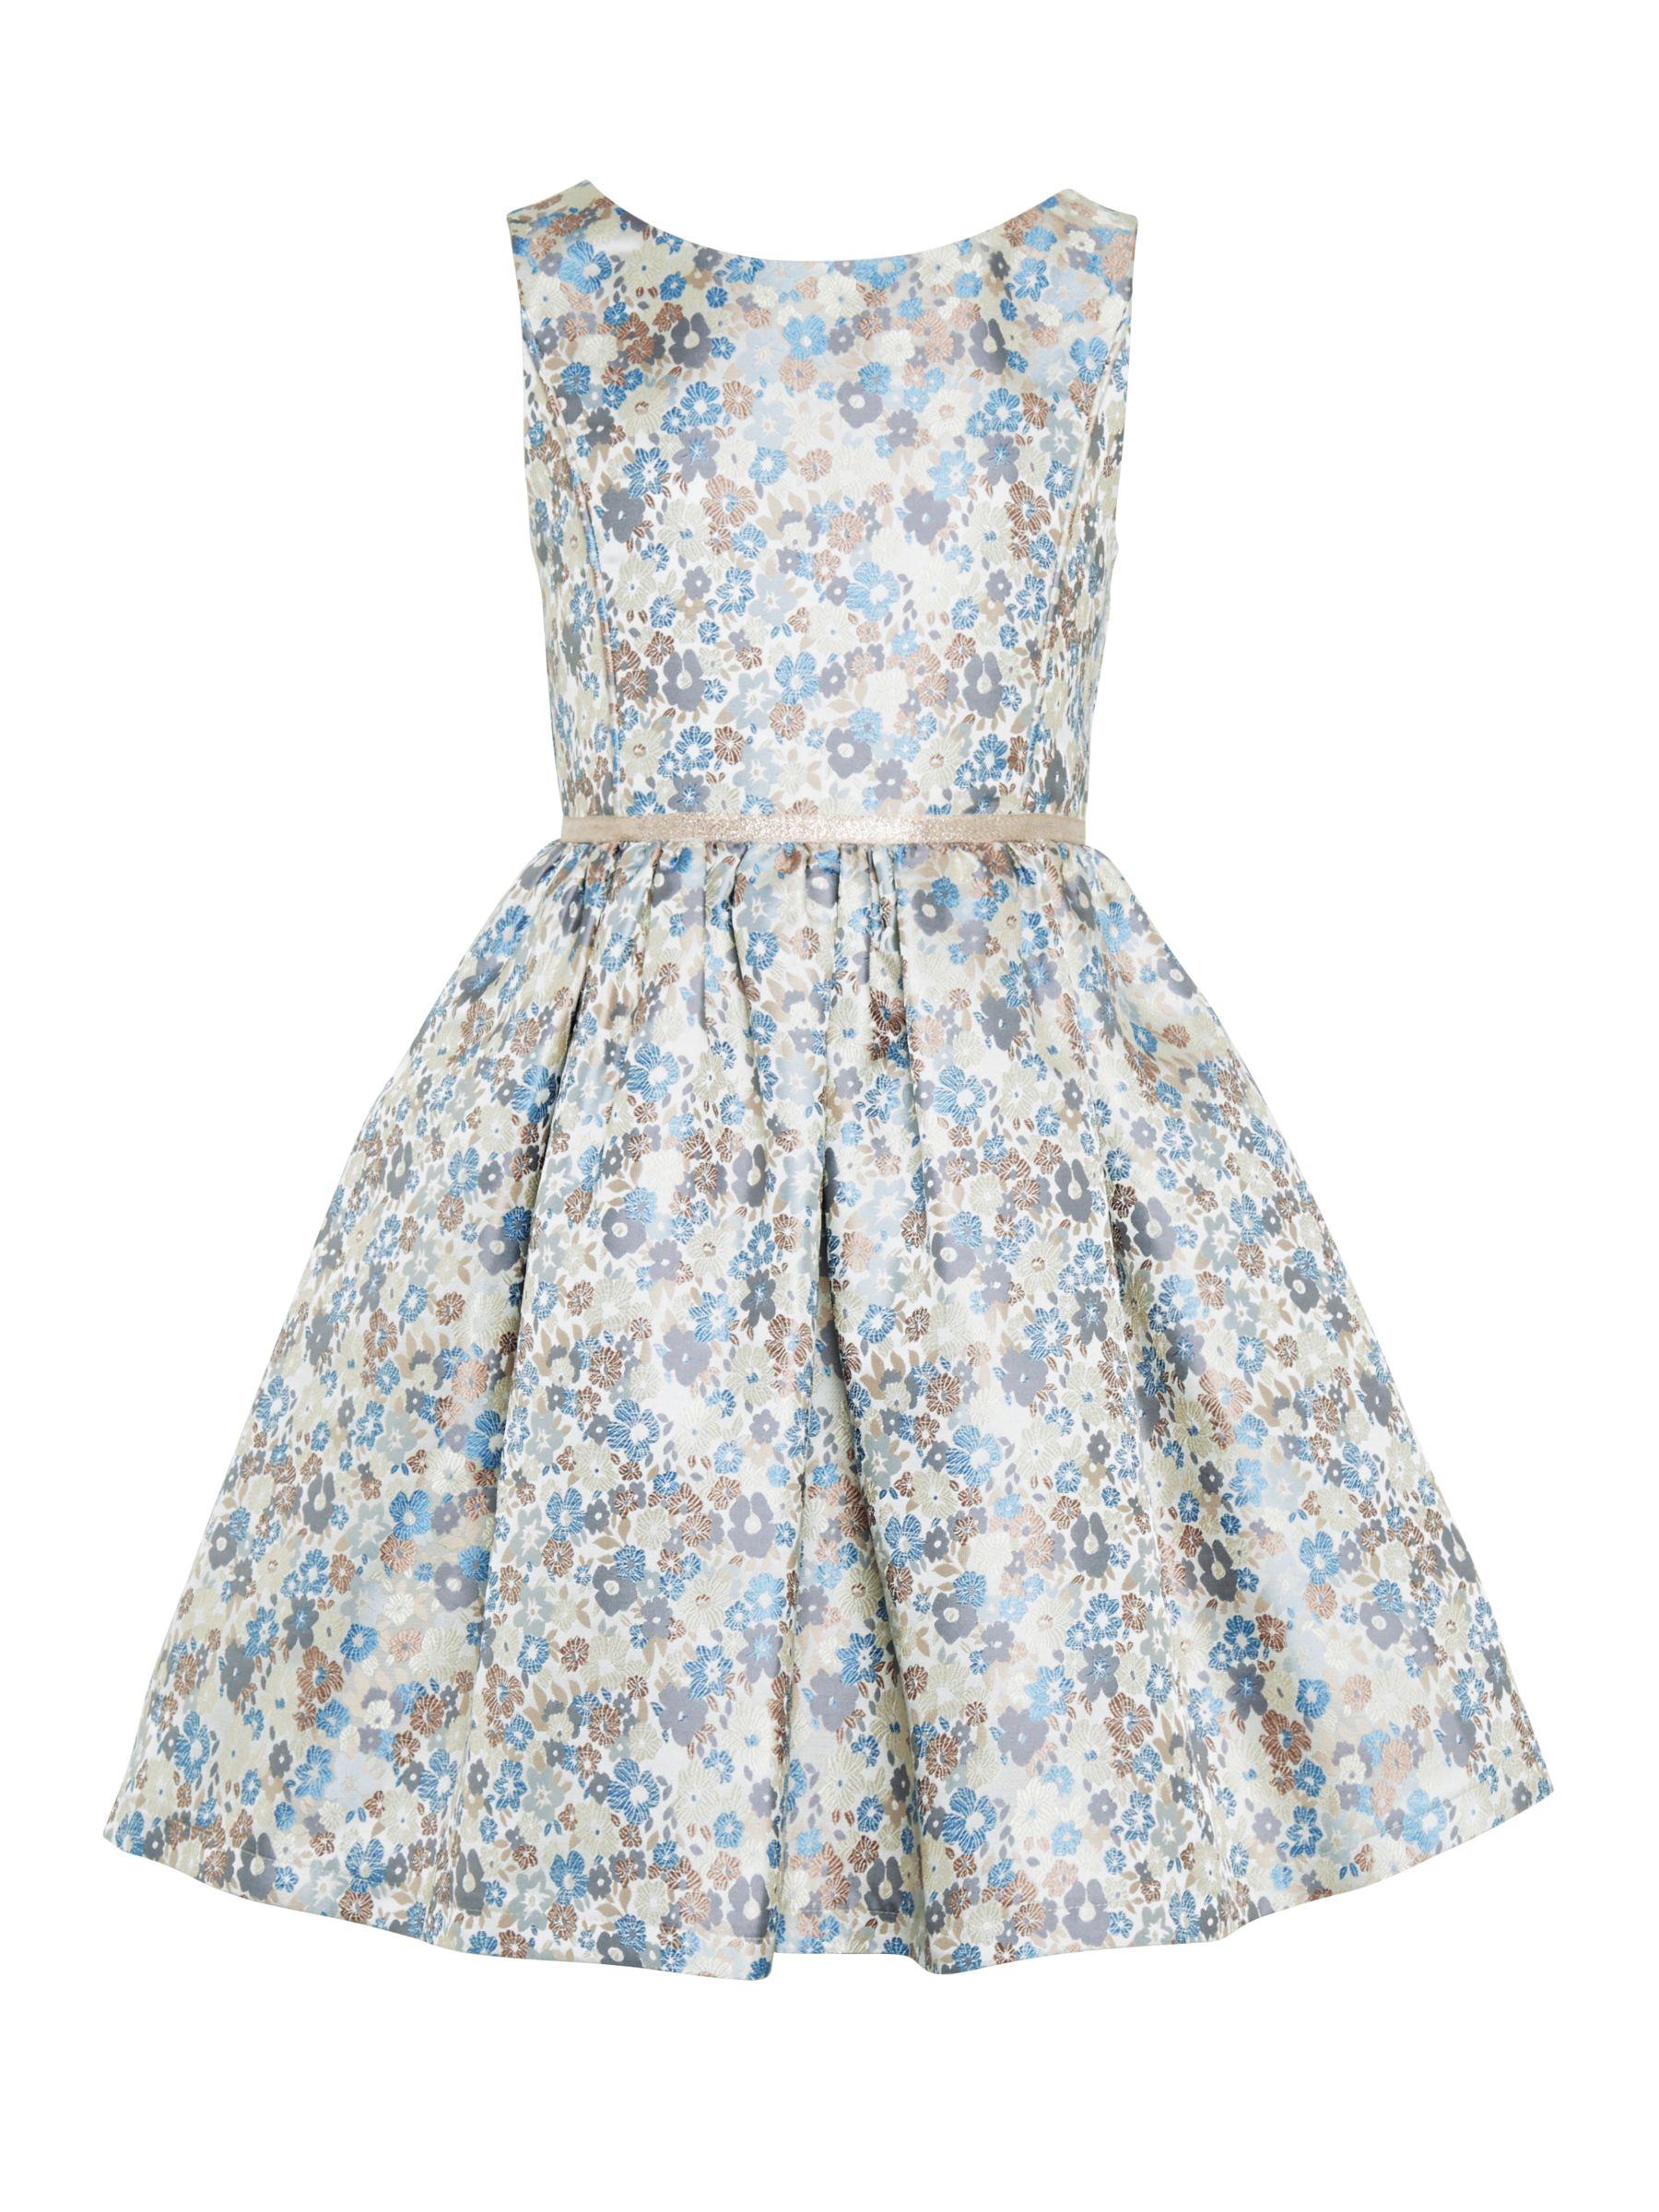 John Lewis Heirloom Collection John Lewis Heirloom Collection Girls' Jacquard Dress, Multi